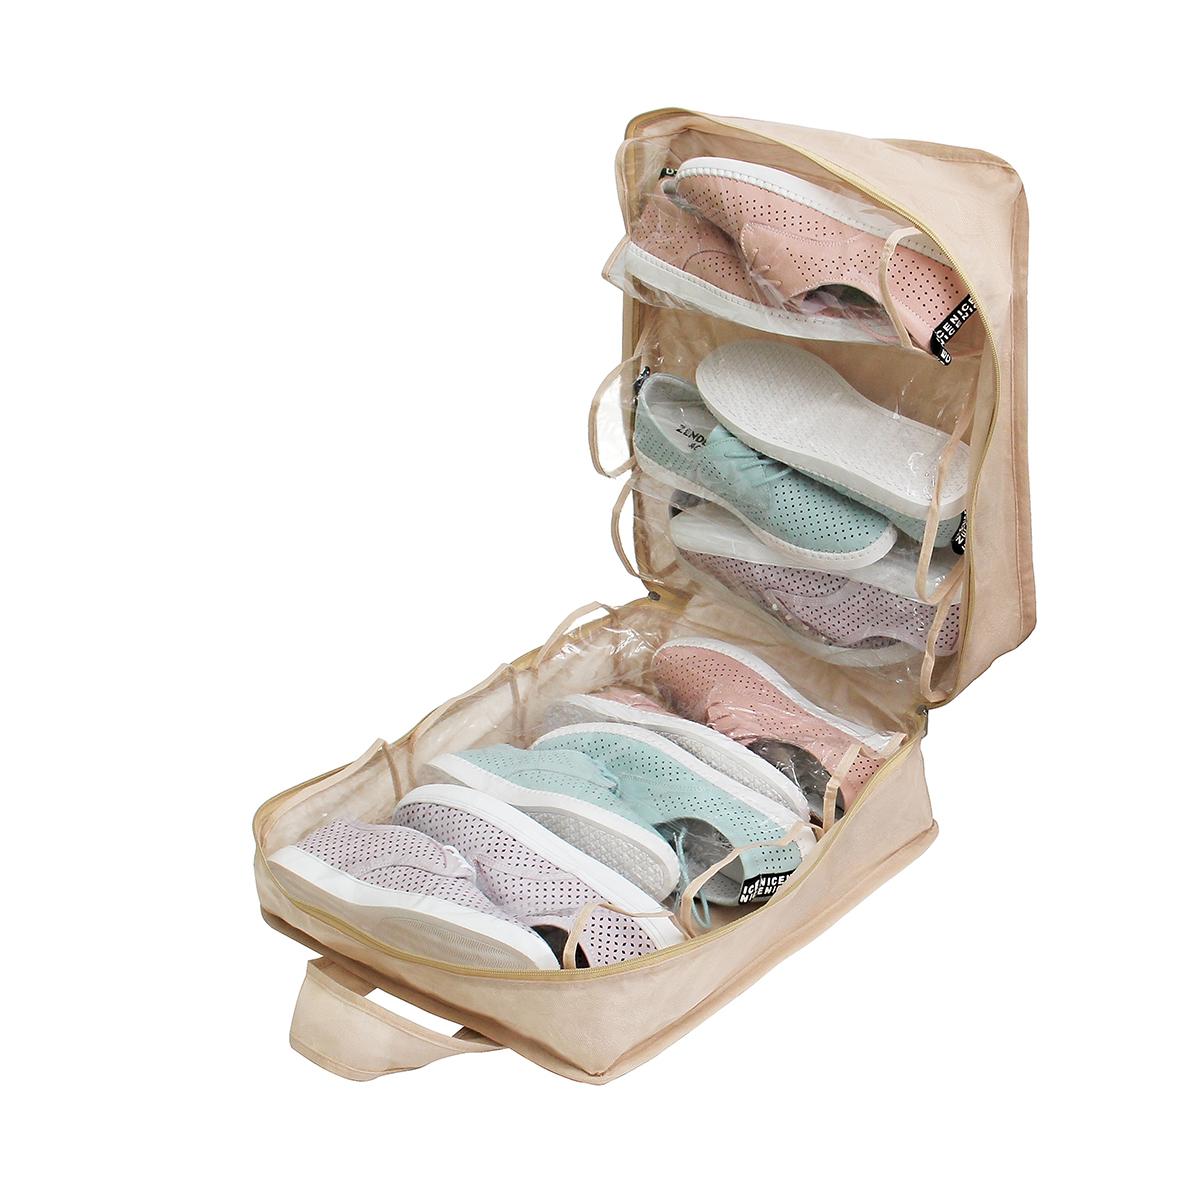 Чемодан для обуви 35х40х20 см, 6 ячеек, Каир